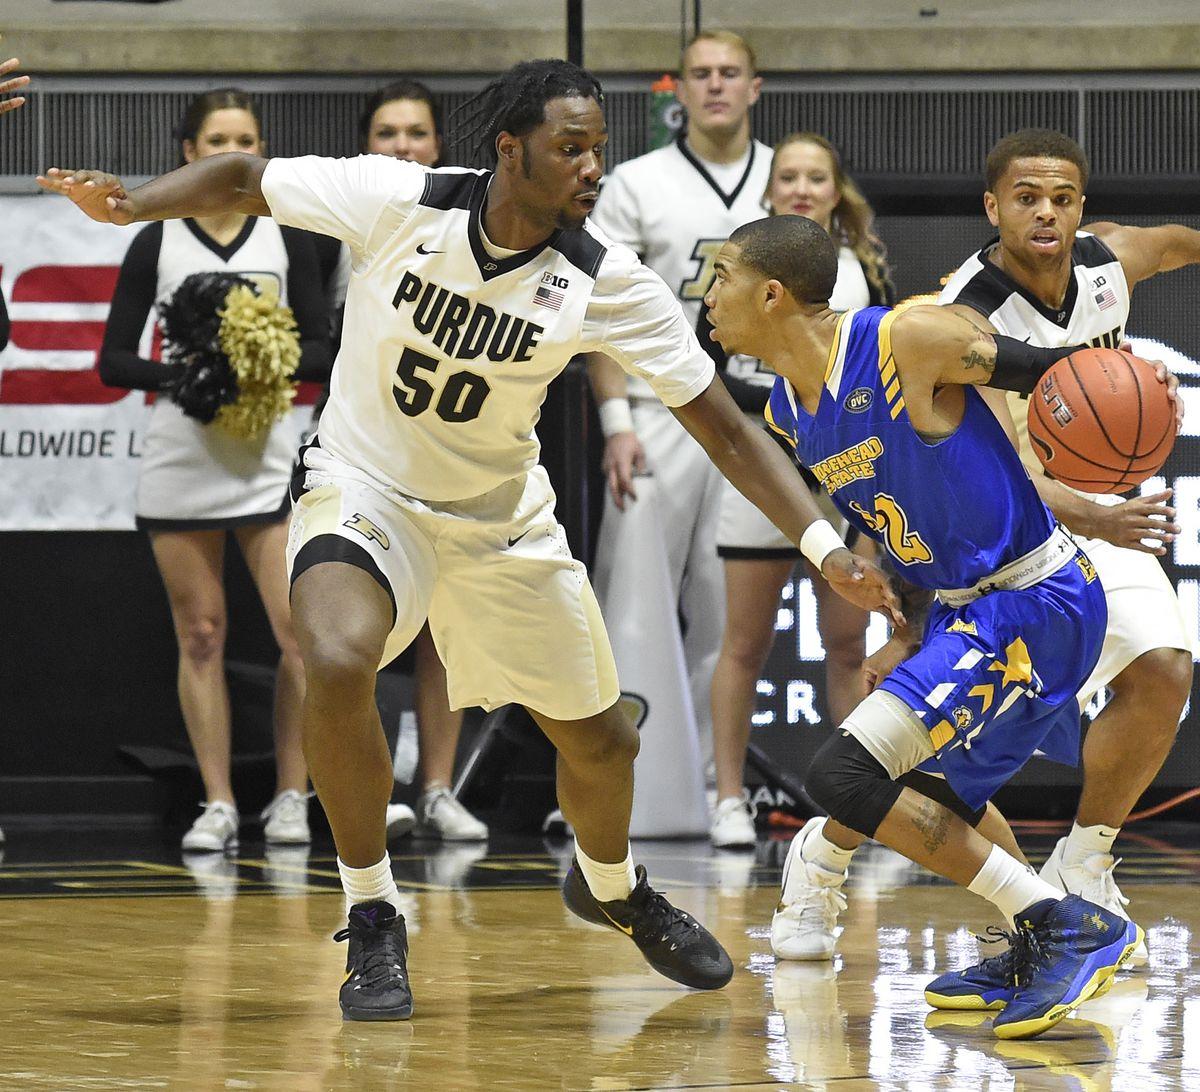 NCAA Basketball: Morehead State at Purdue